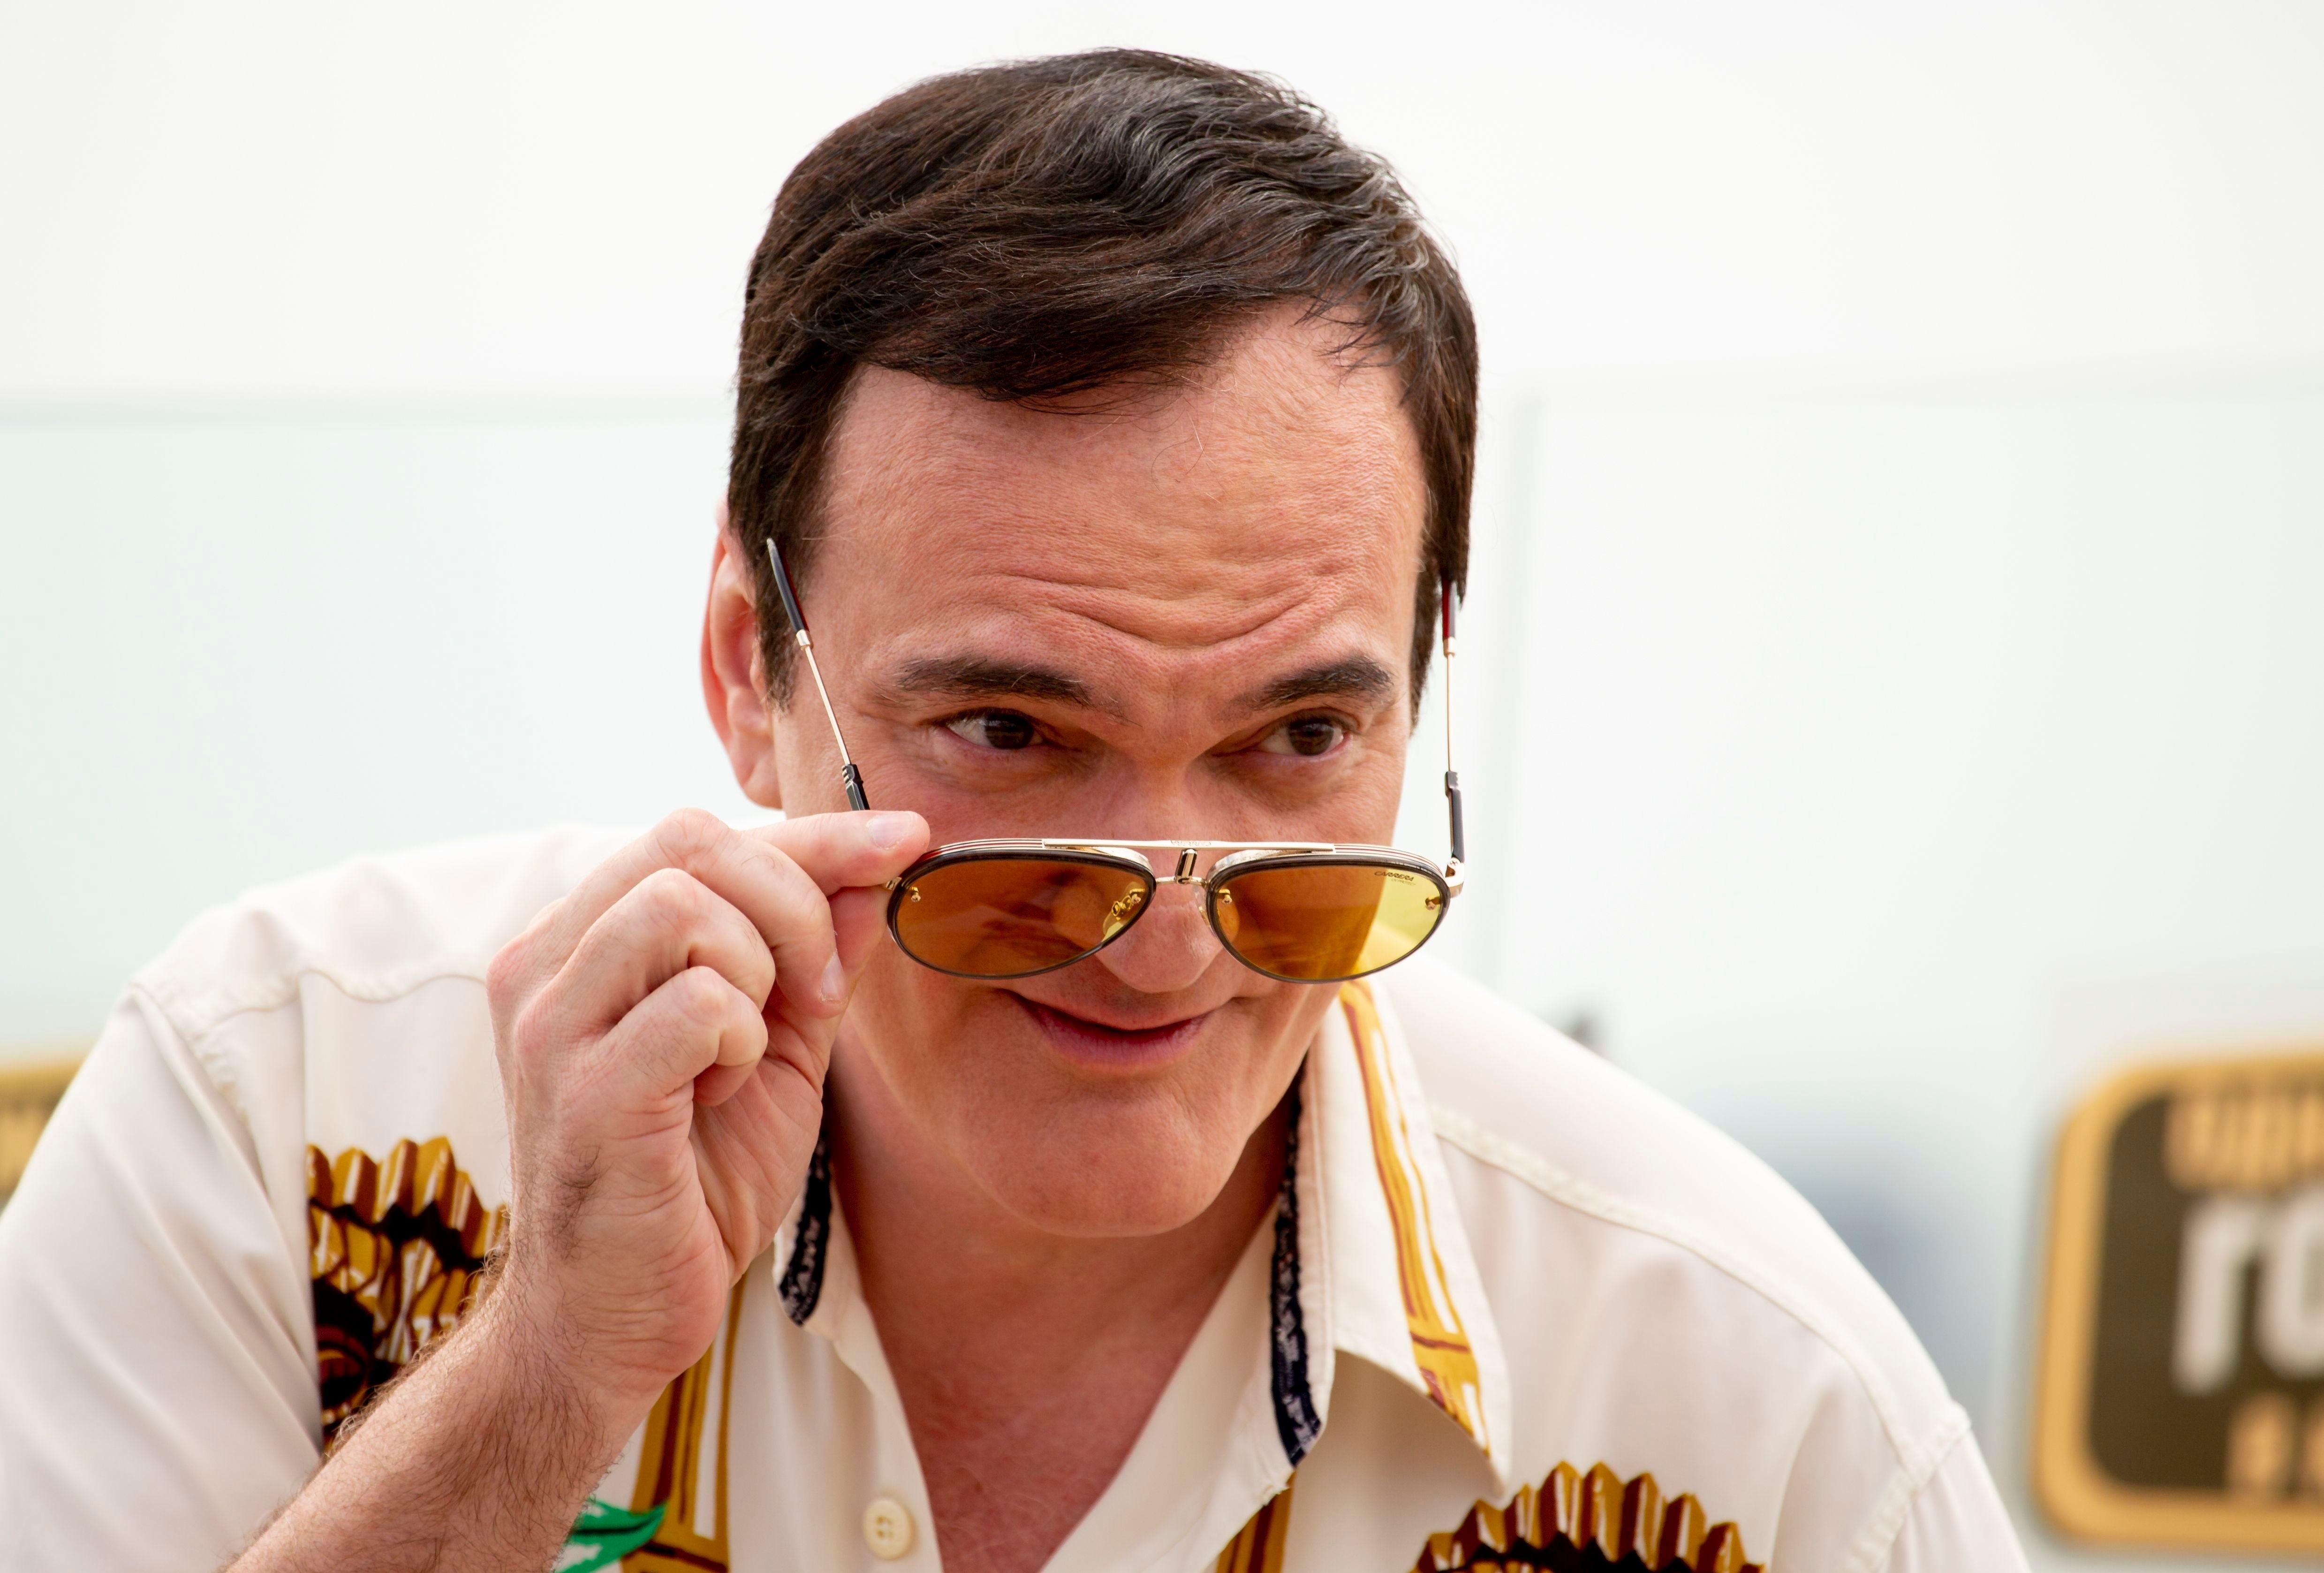 Tarantino Praises 'Dunkirk' as Decade's Second Best Film, Shares 'Ad Astra' Criticism